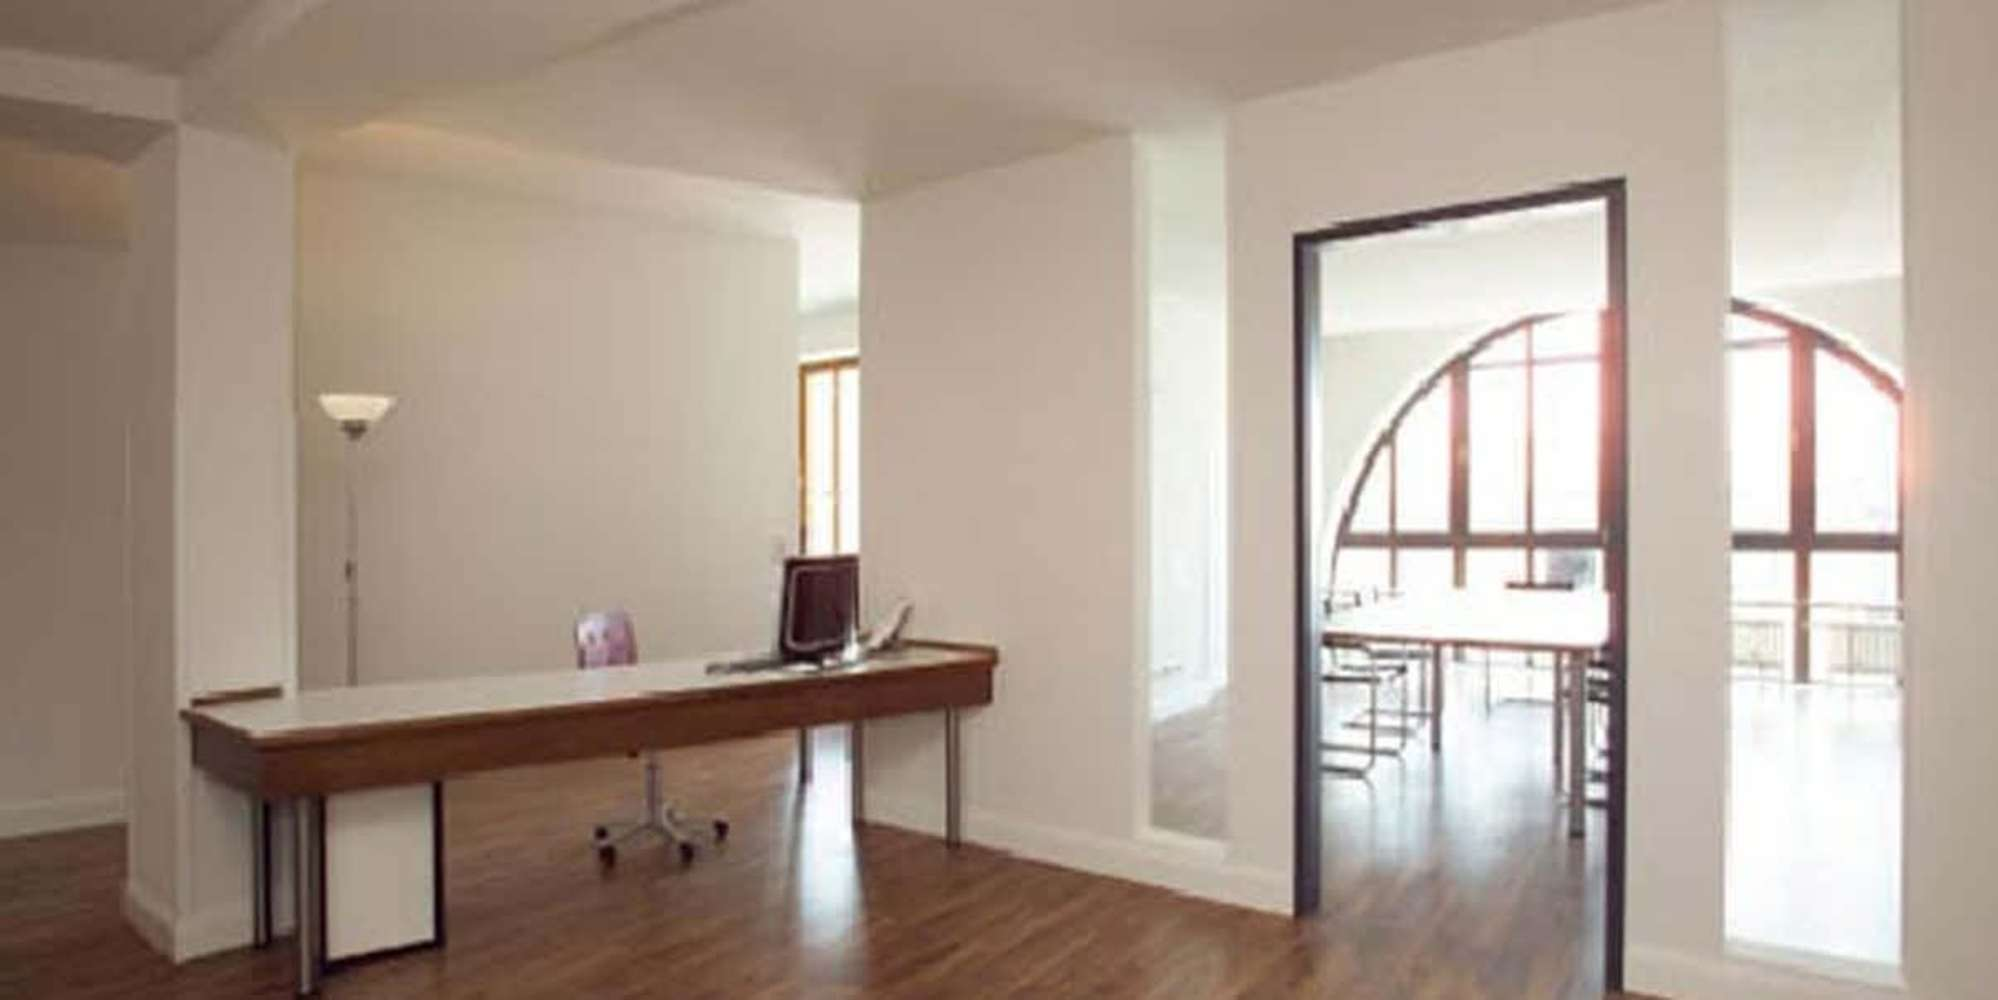 Büros Hamburg, 20537 - Büro - Hamburg, Hamm - H0204 - 9394497